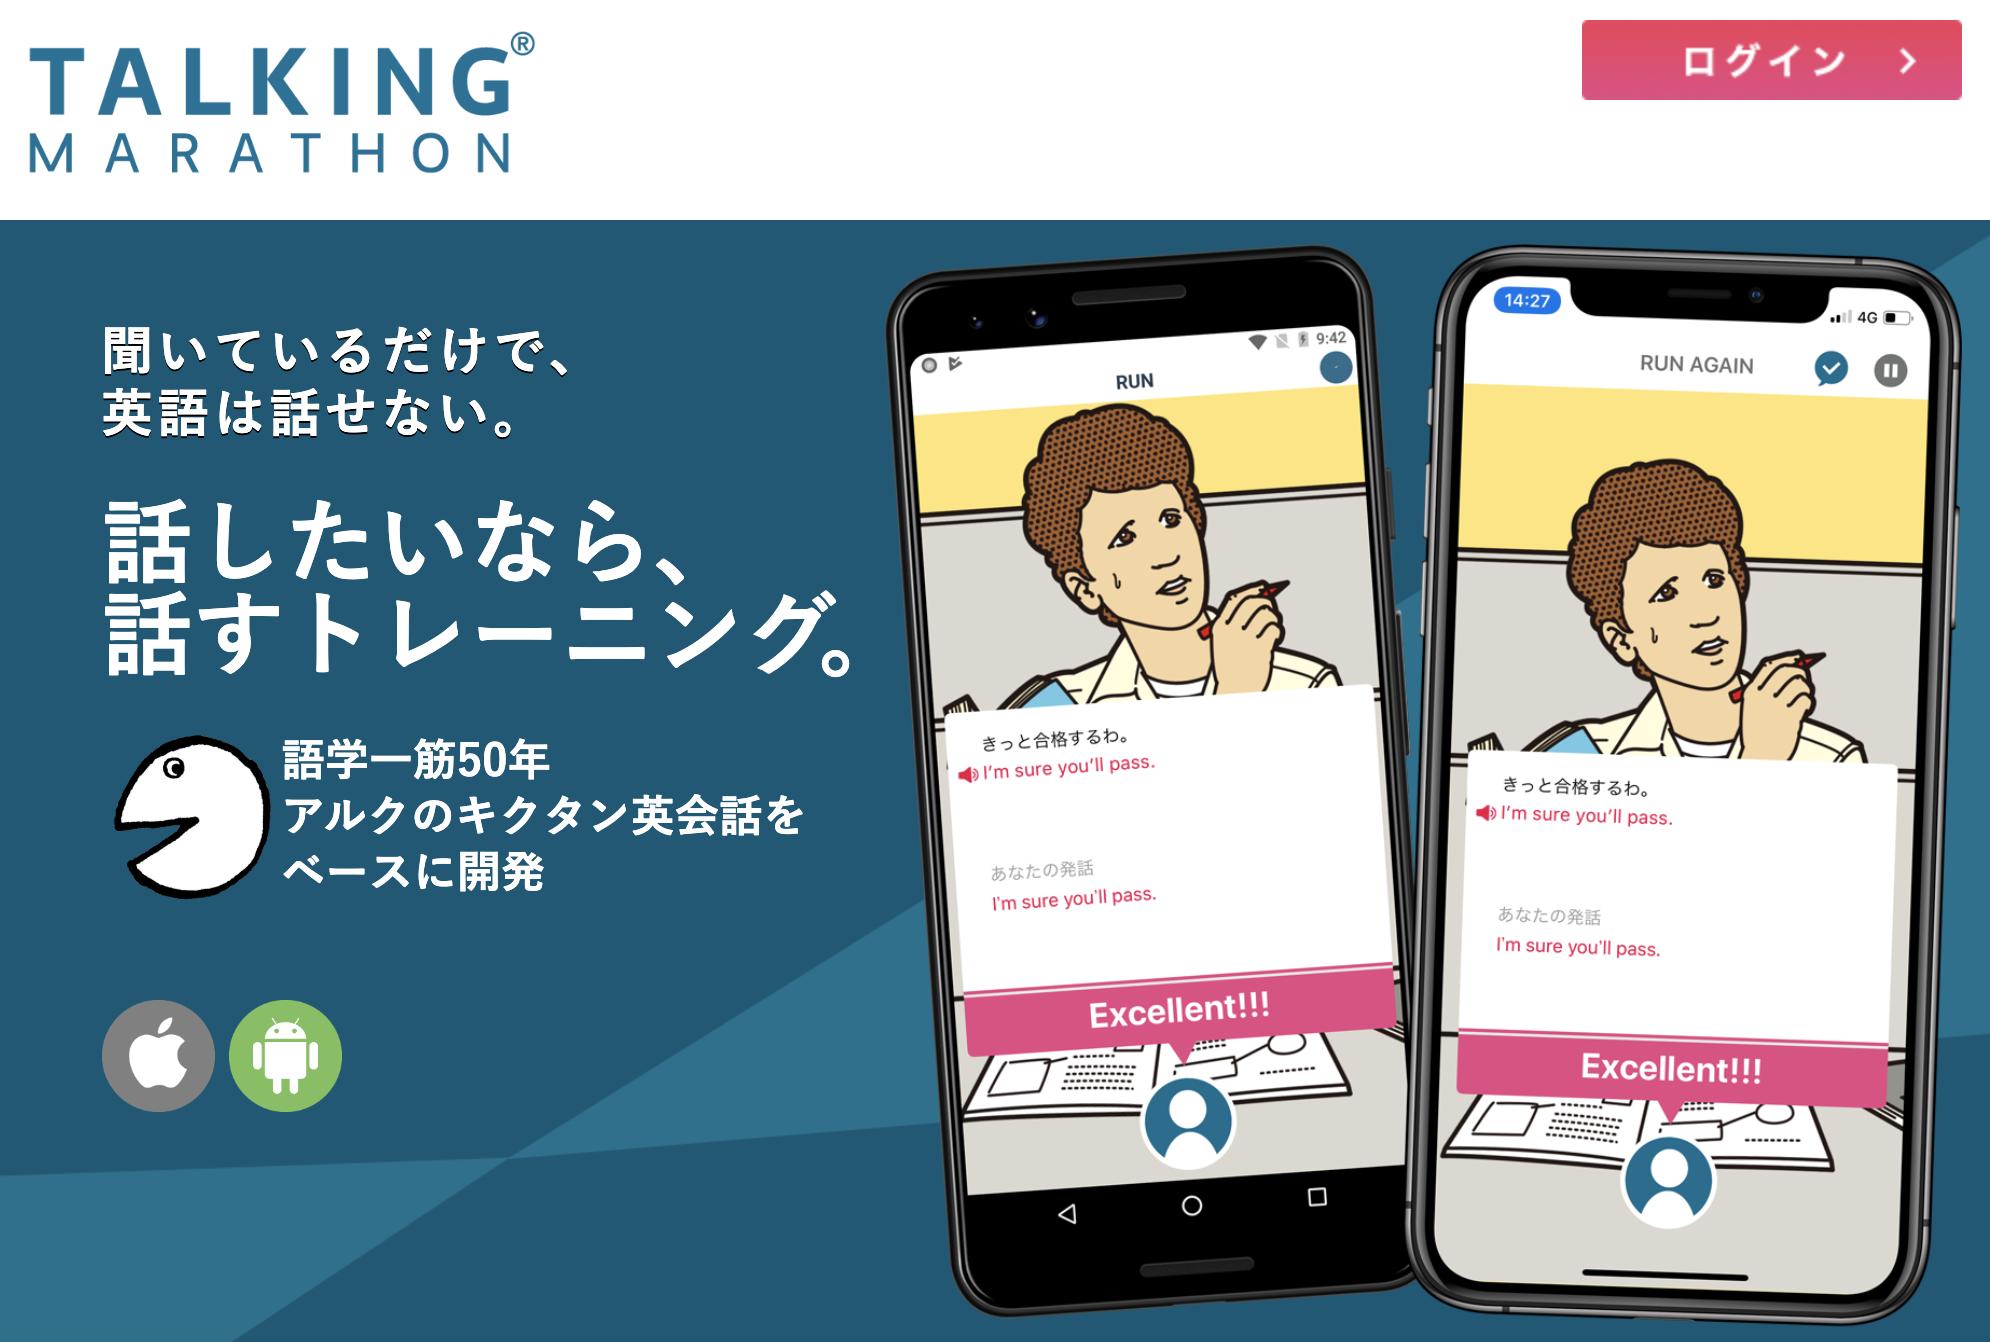 TALKING Marathonホームページ